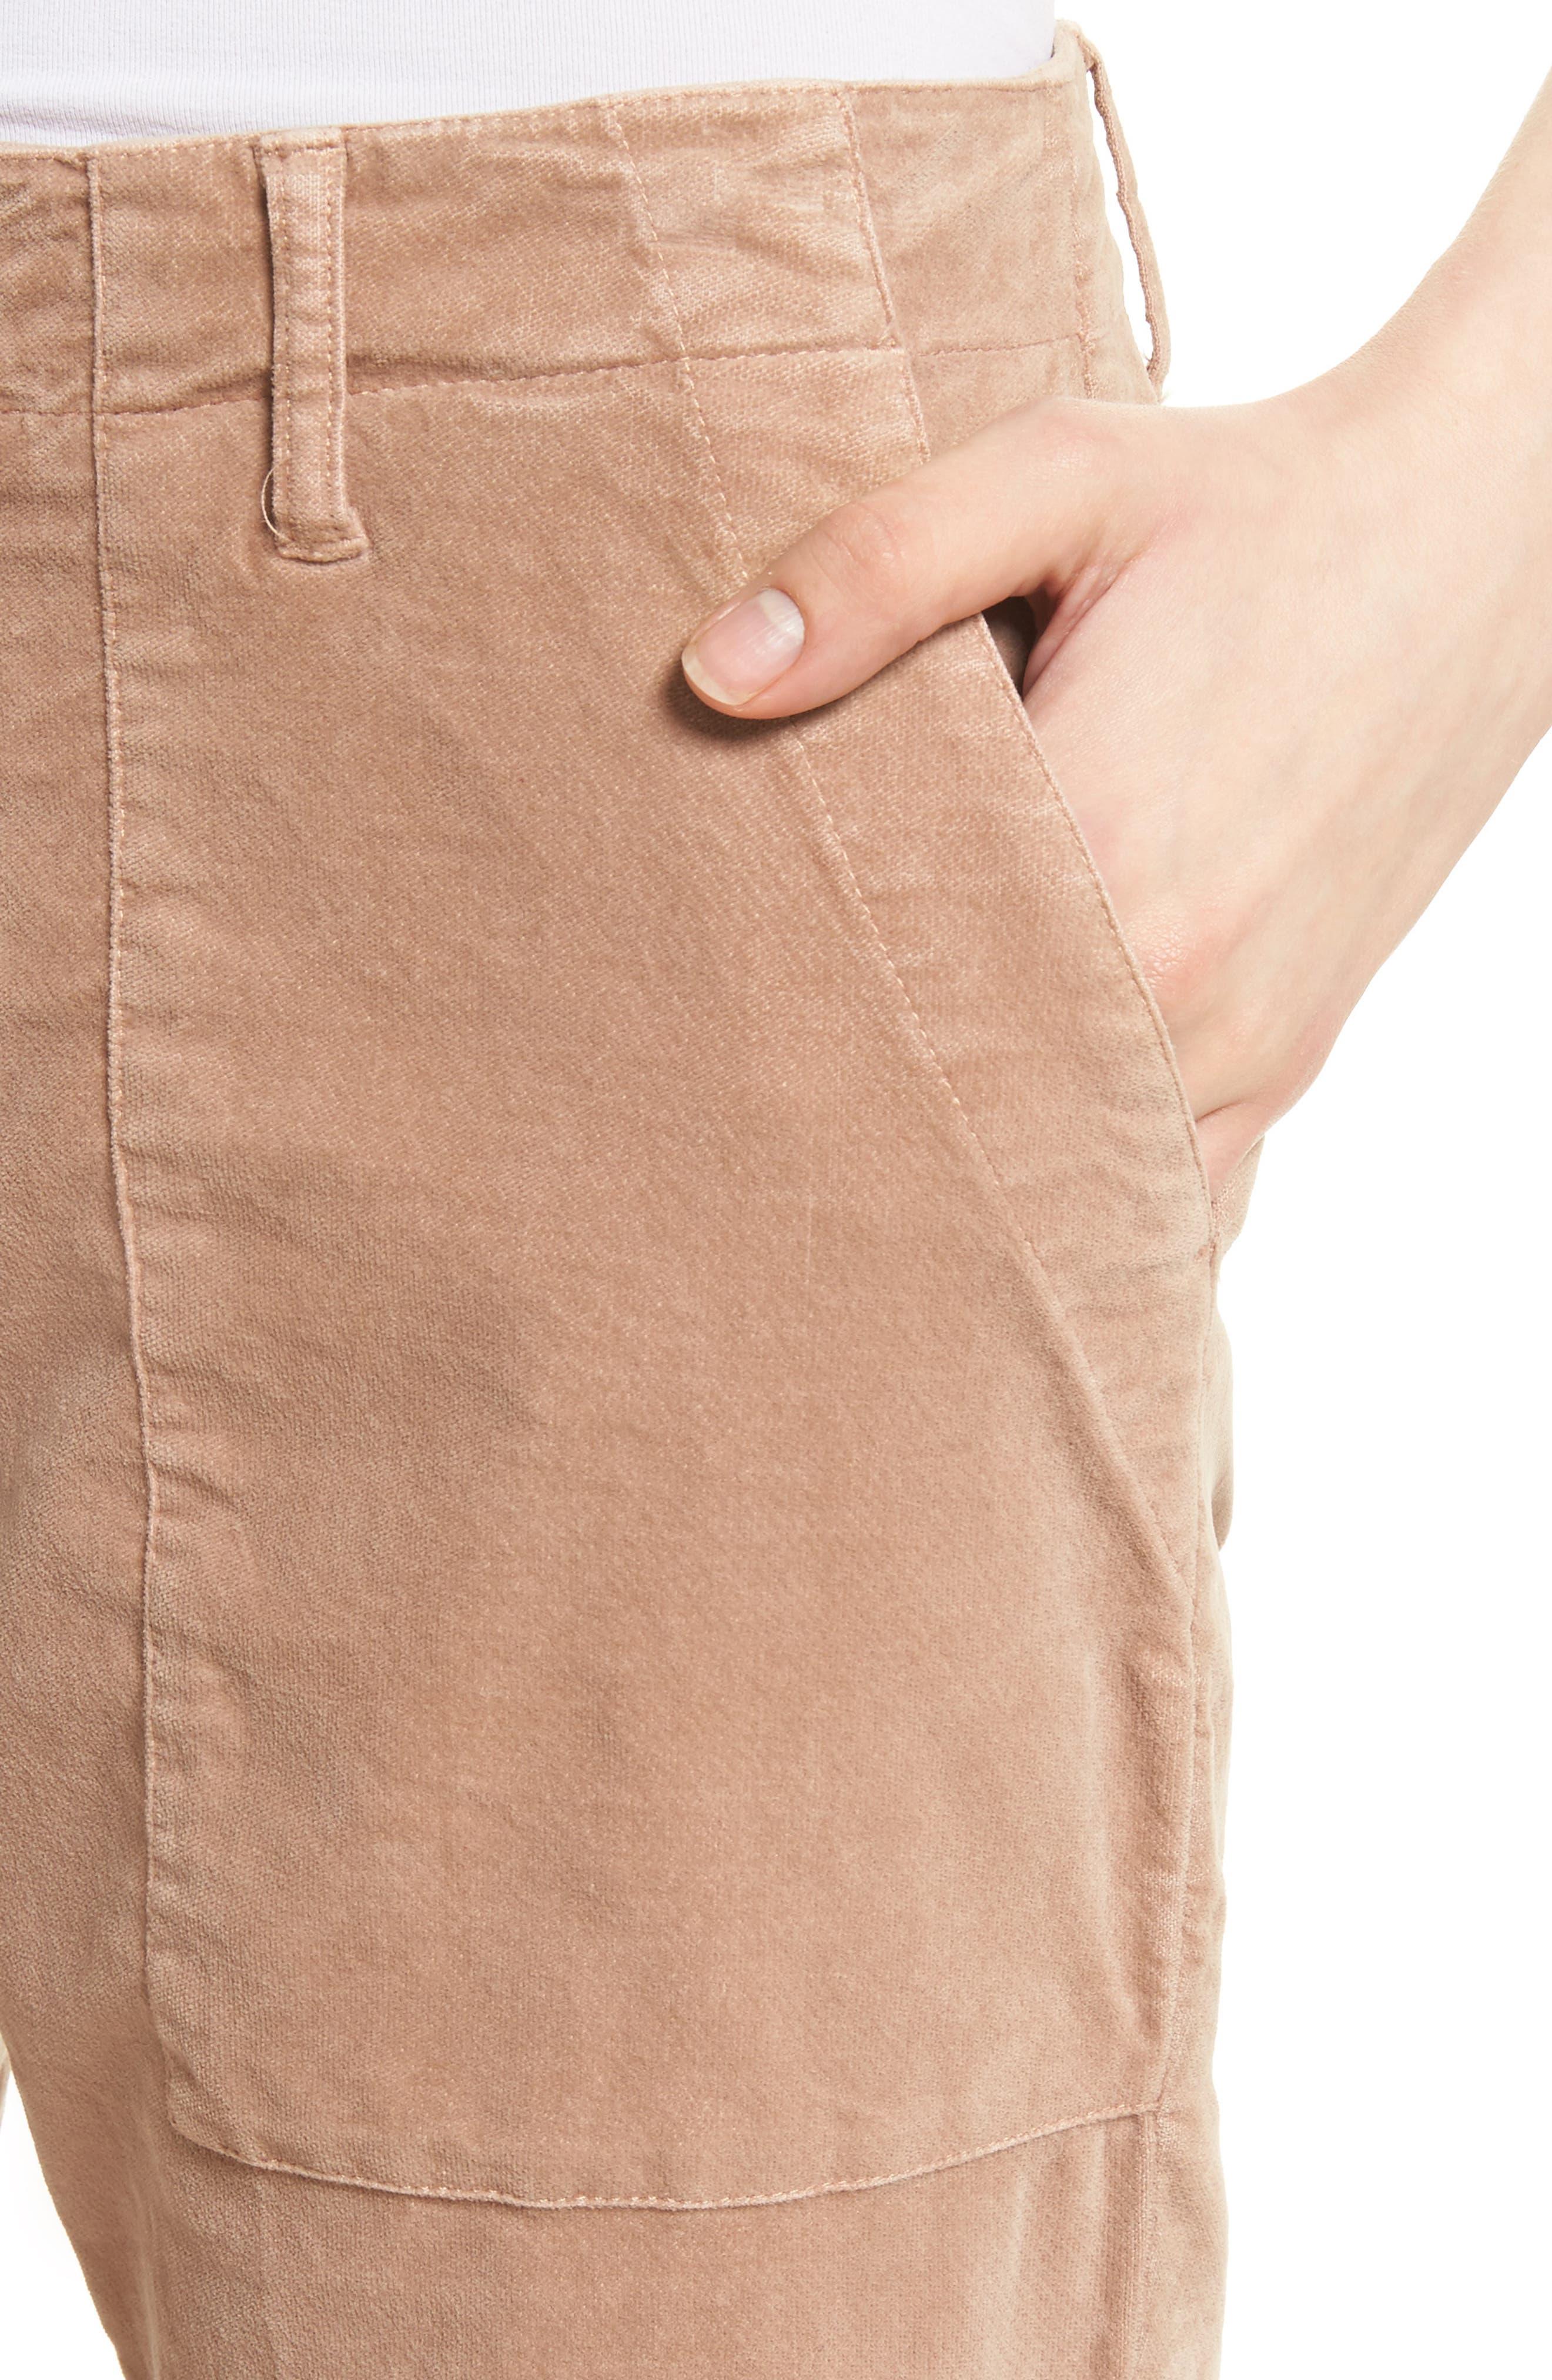 Painter Chino Pants,                             Alternate thumbnail 5, color,                             Deep Blush